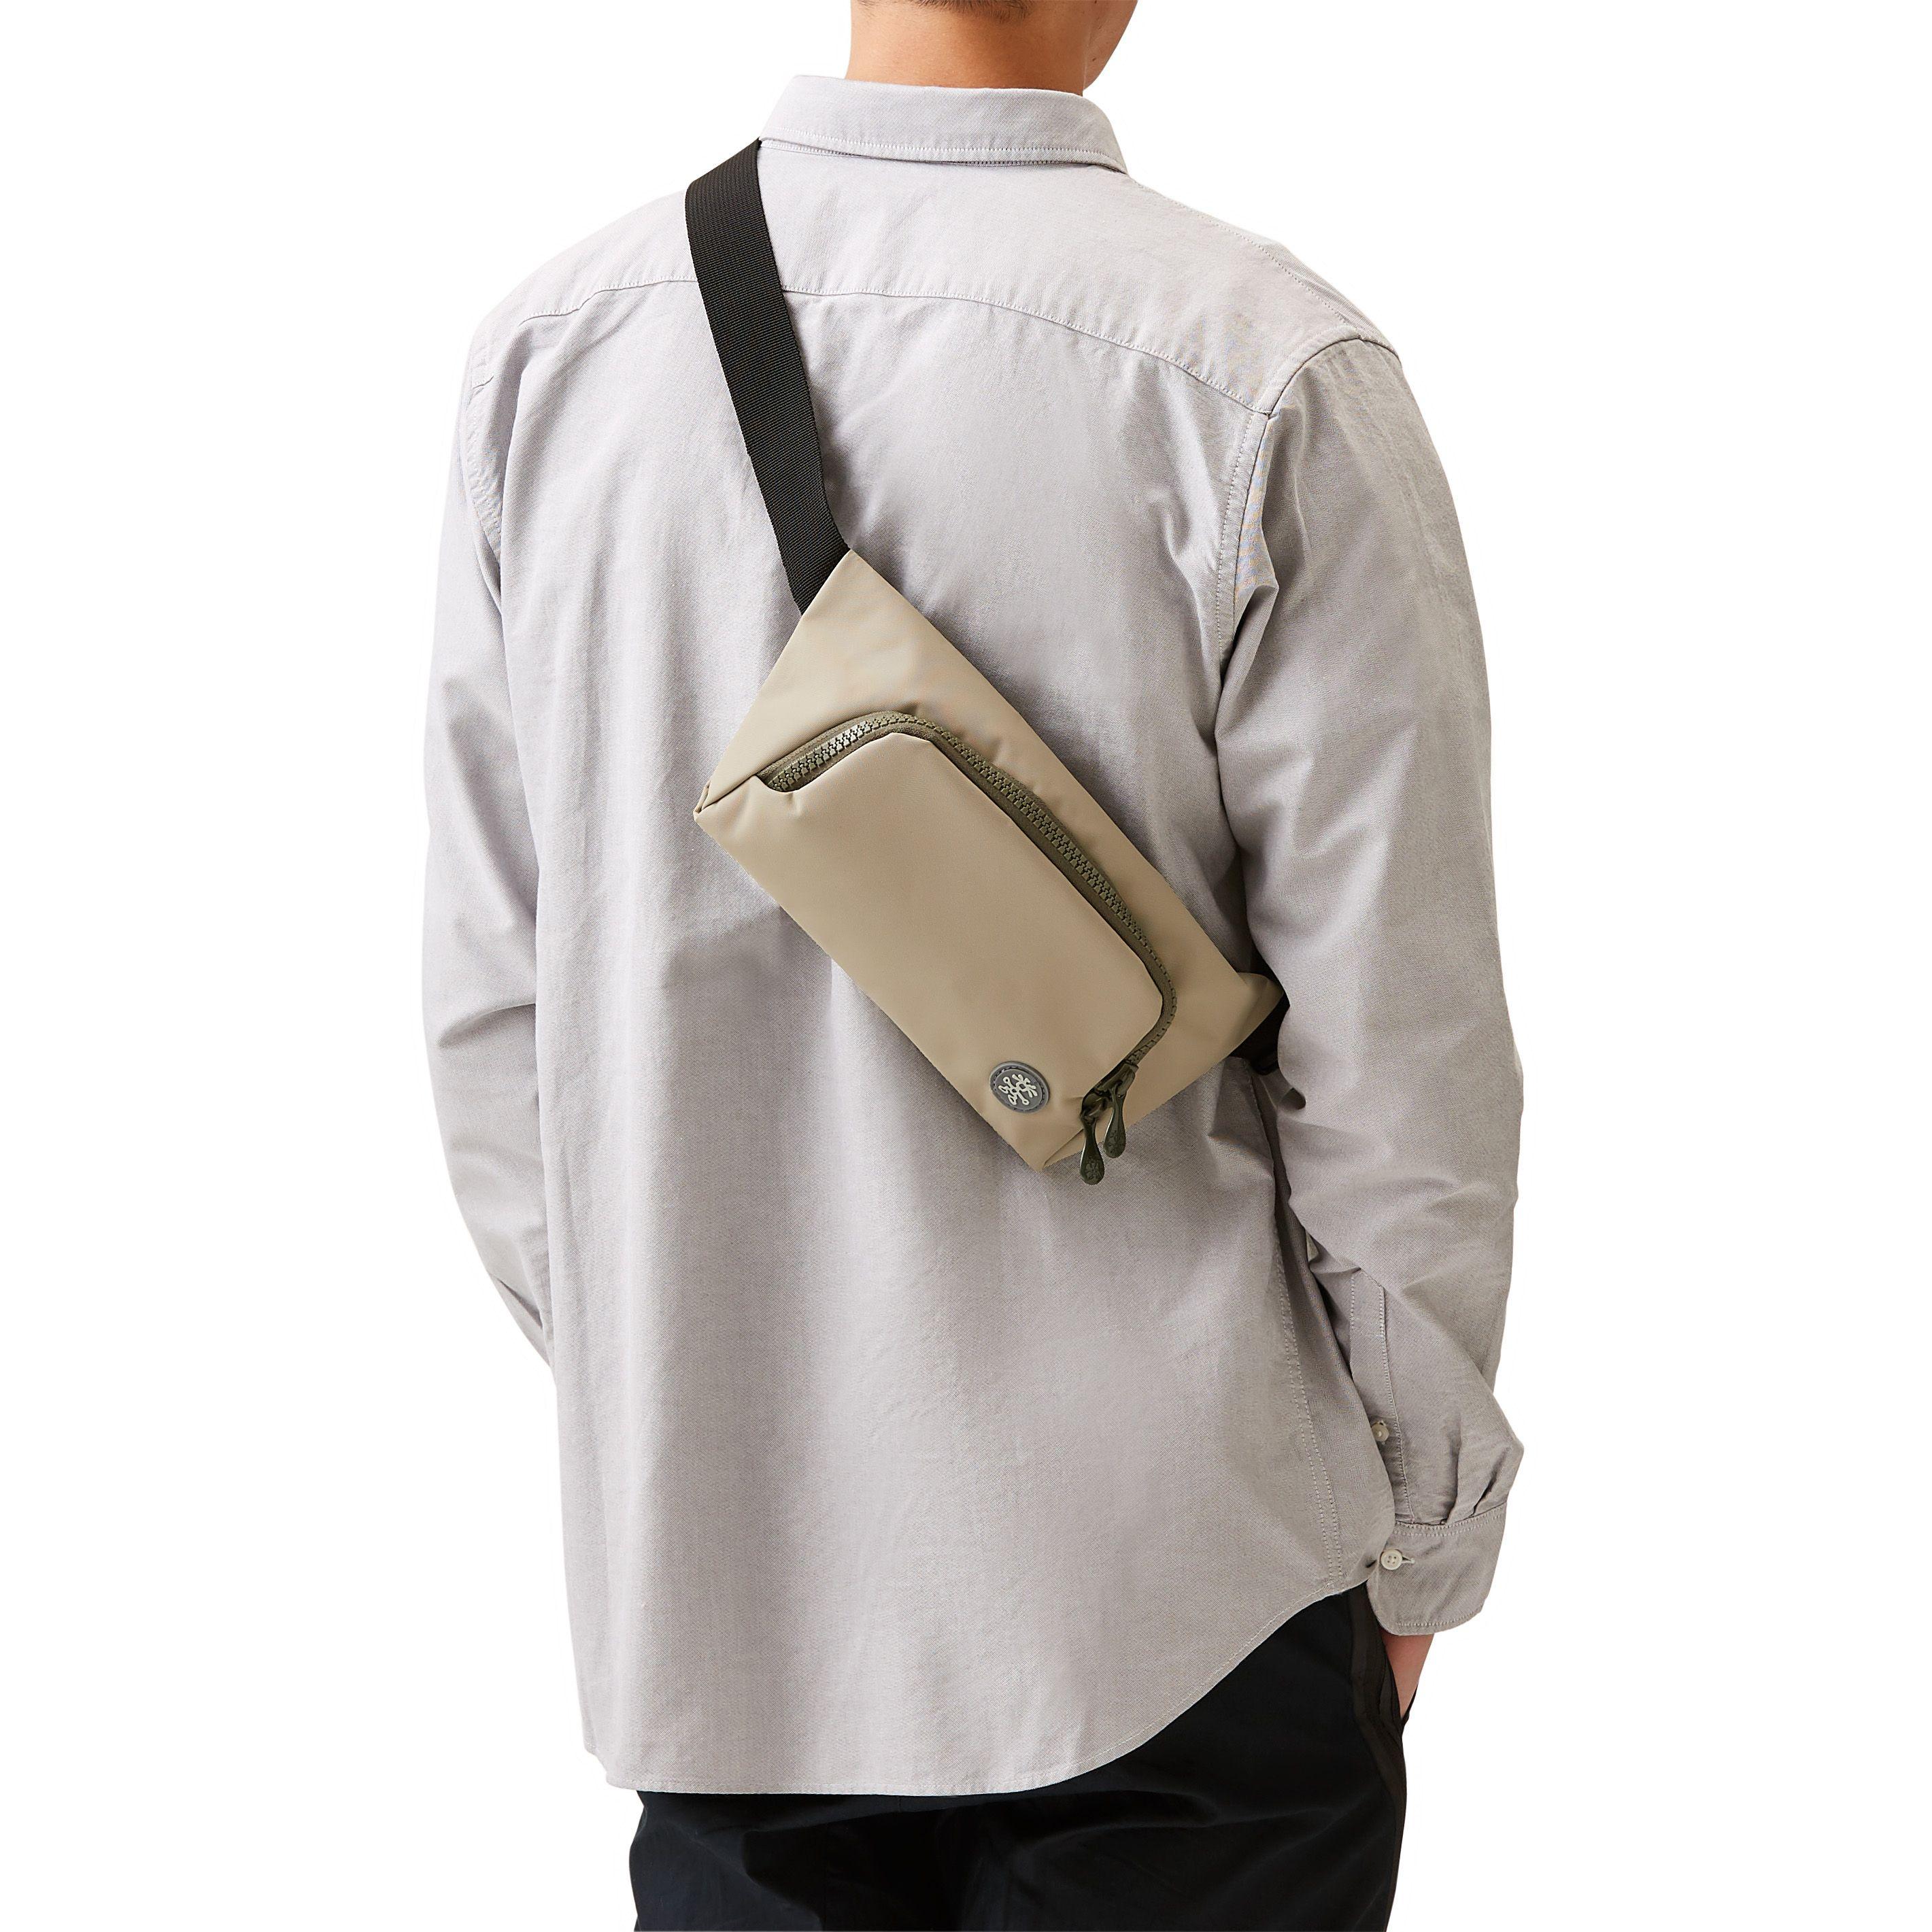 Engagement & Wedding Good Brand Men Messenger Bag Male Versatile Casual Outdoor Travel Sport Crossbody Bag High Quality Pu Leather Chest Shoulder Bag New Luxuriant In Design